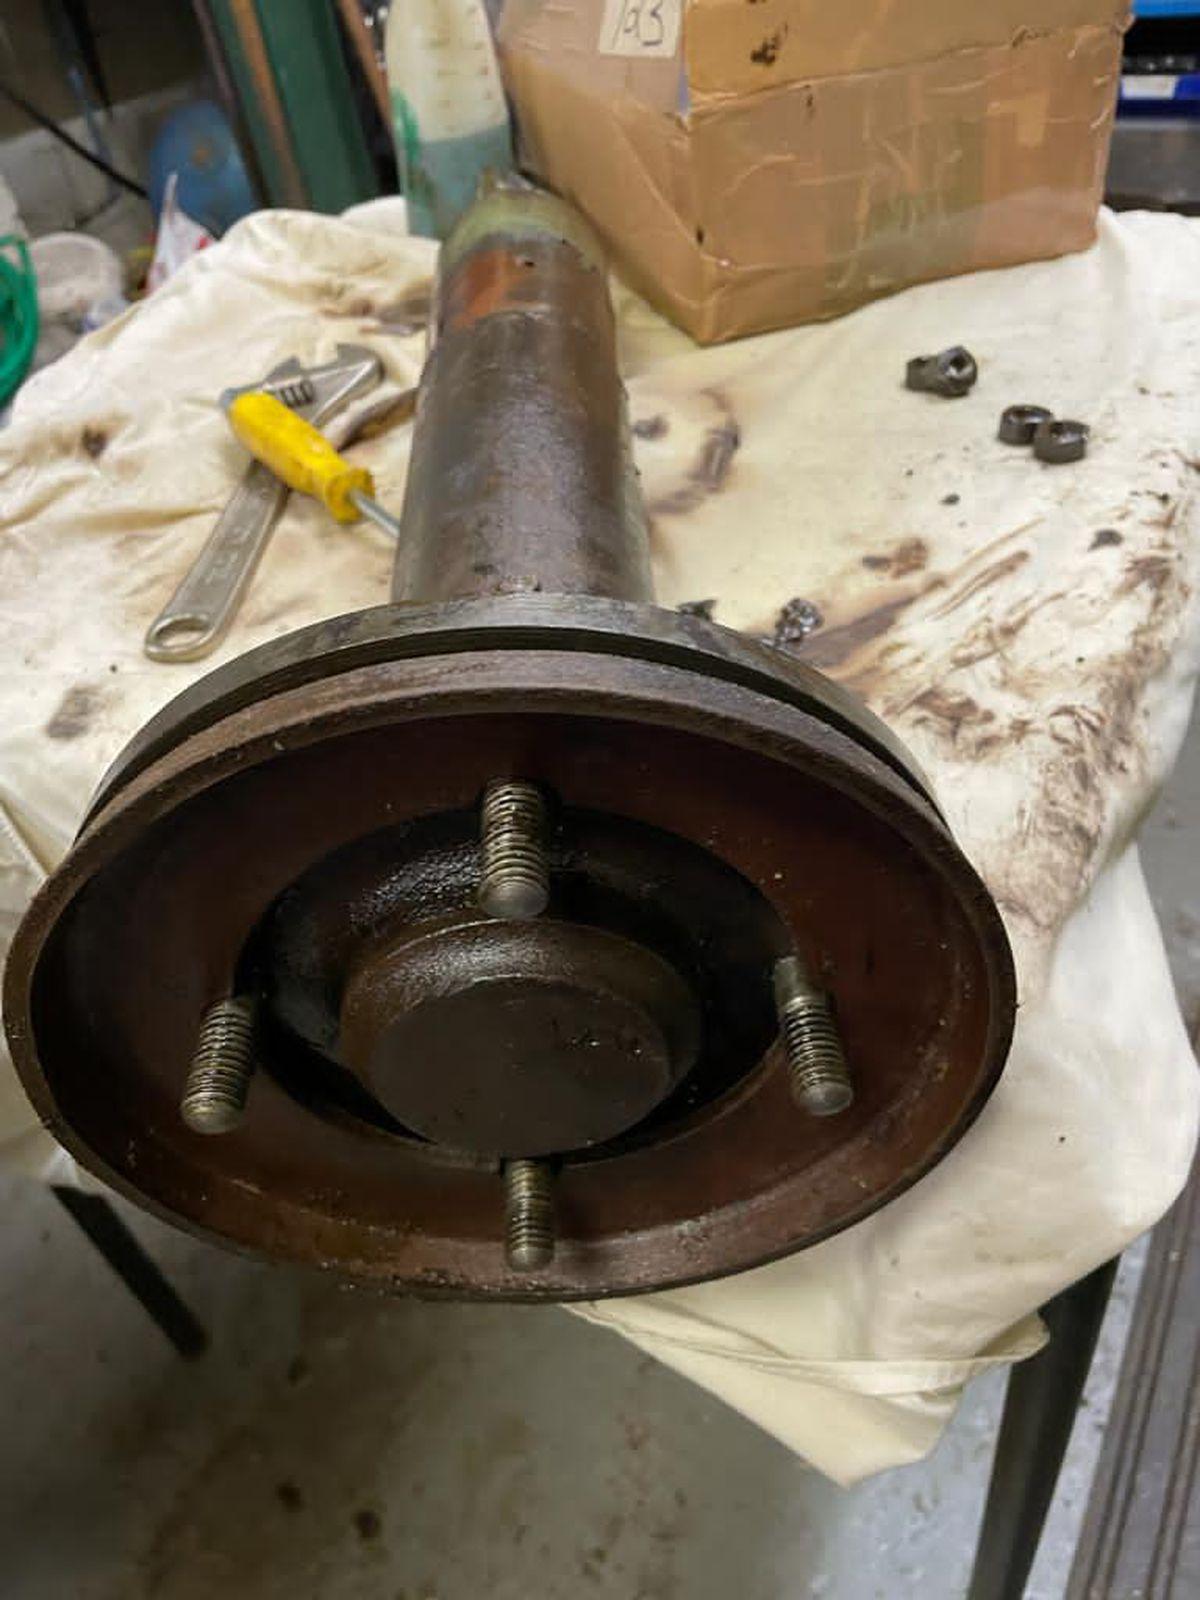 Brake piston seals which needed repairing